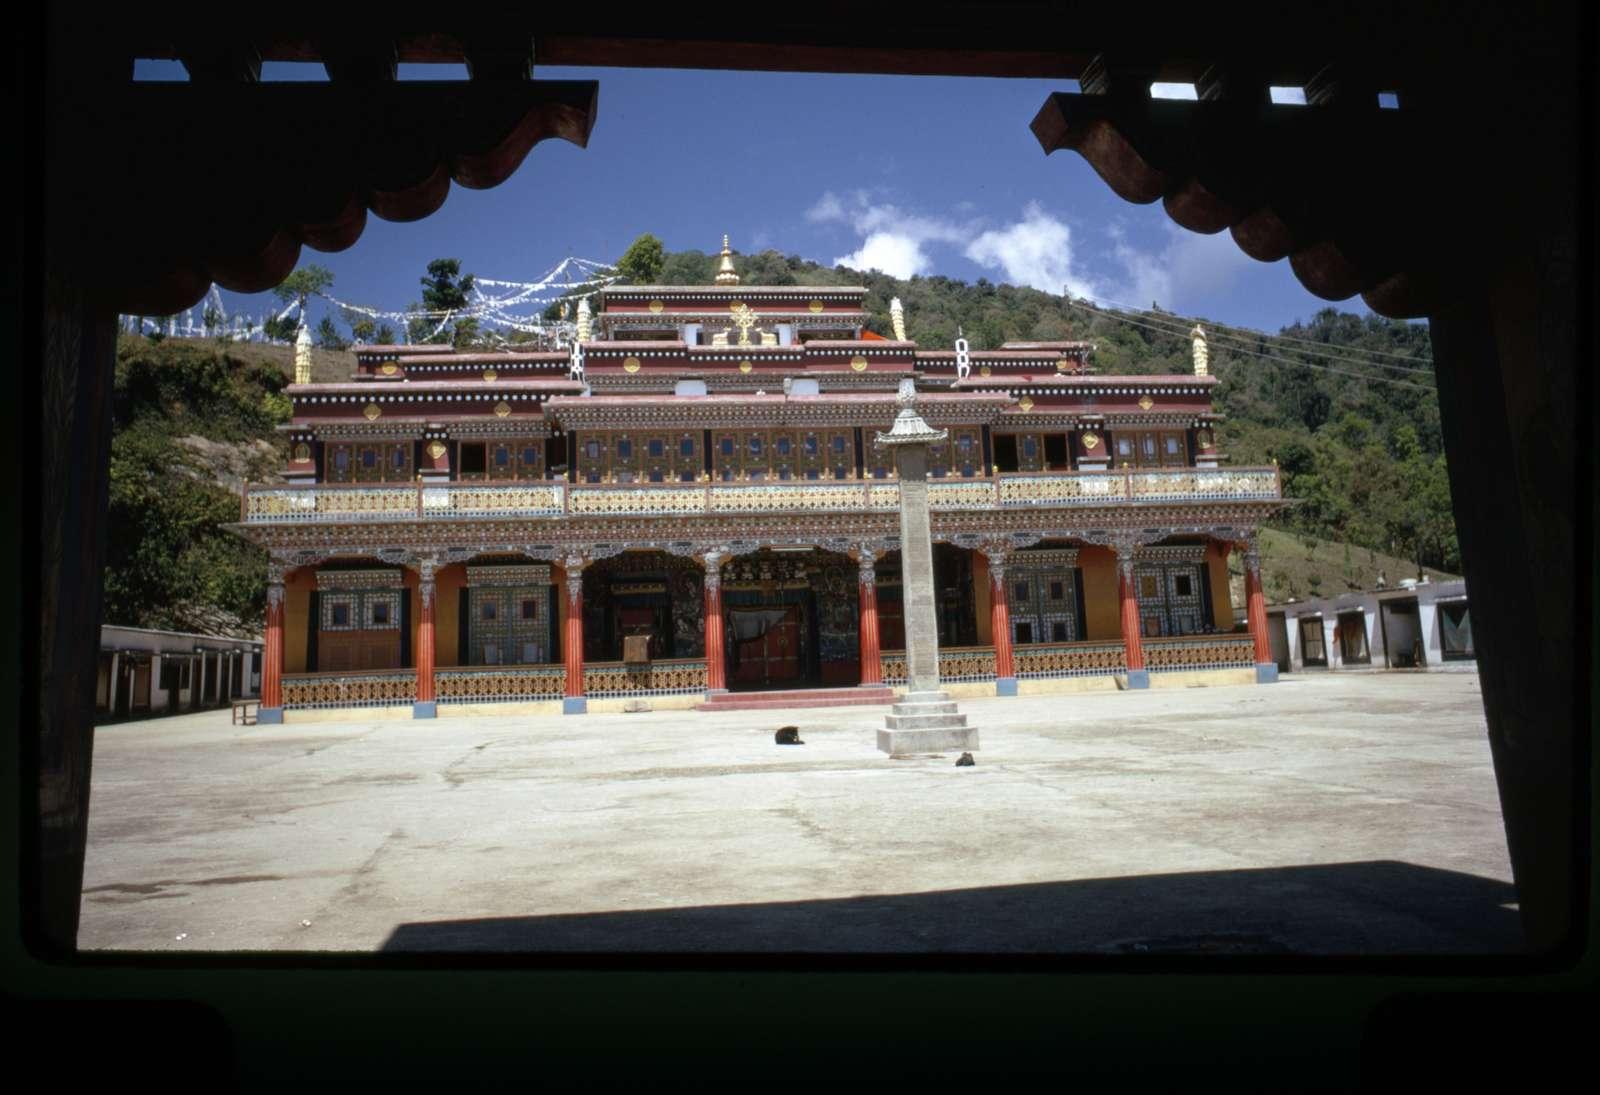 [Rumtek Monastery seen from across courtyard, Sikkim]